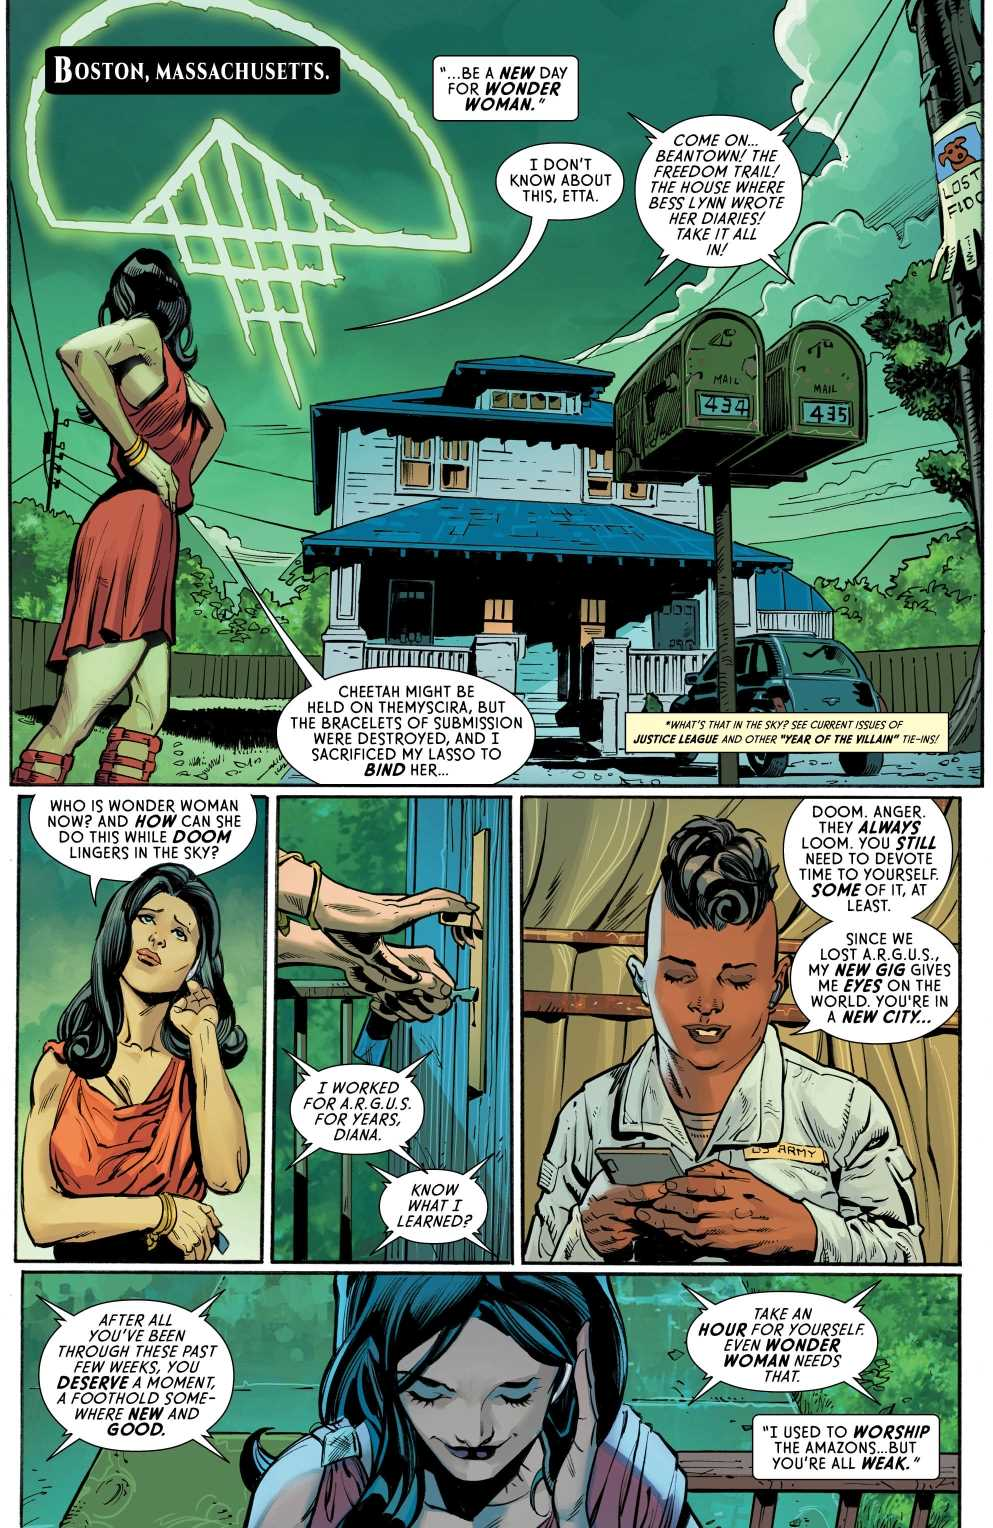 Wonder Woman #82, Page #5: Diana talks to Etta in Boston.